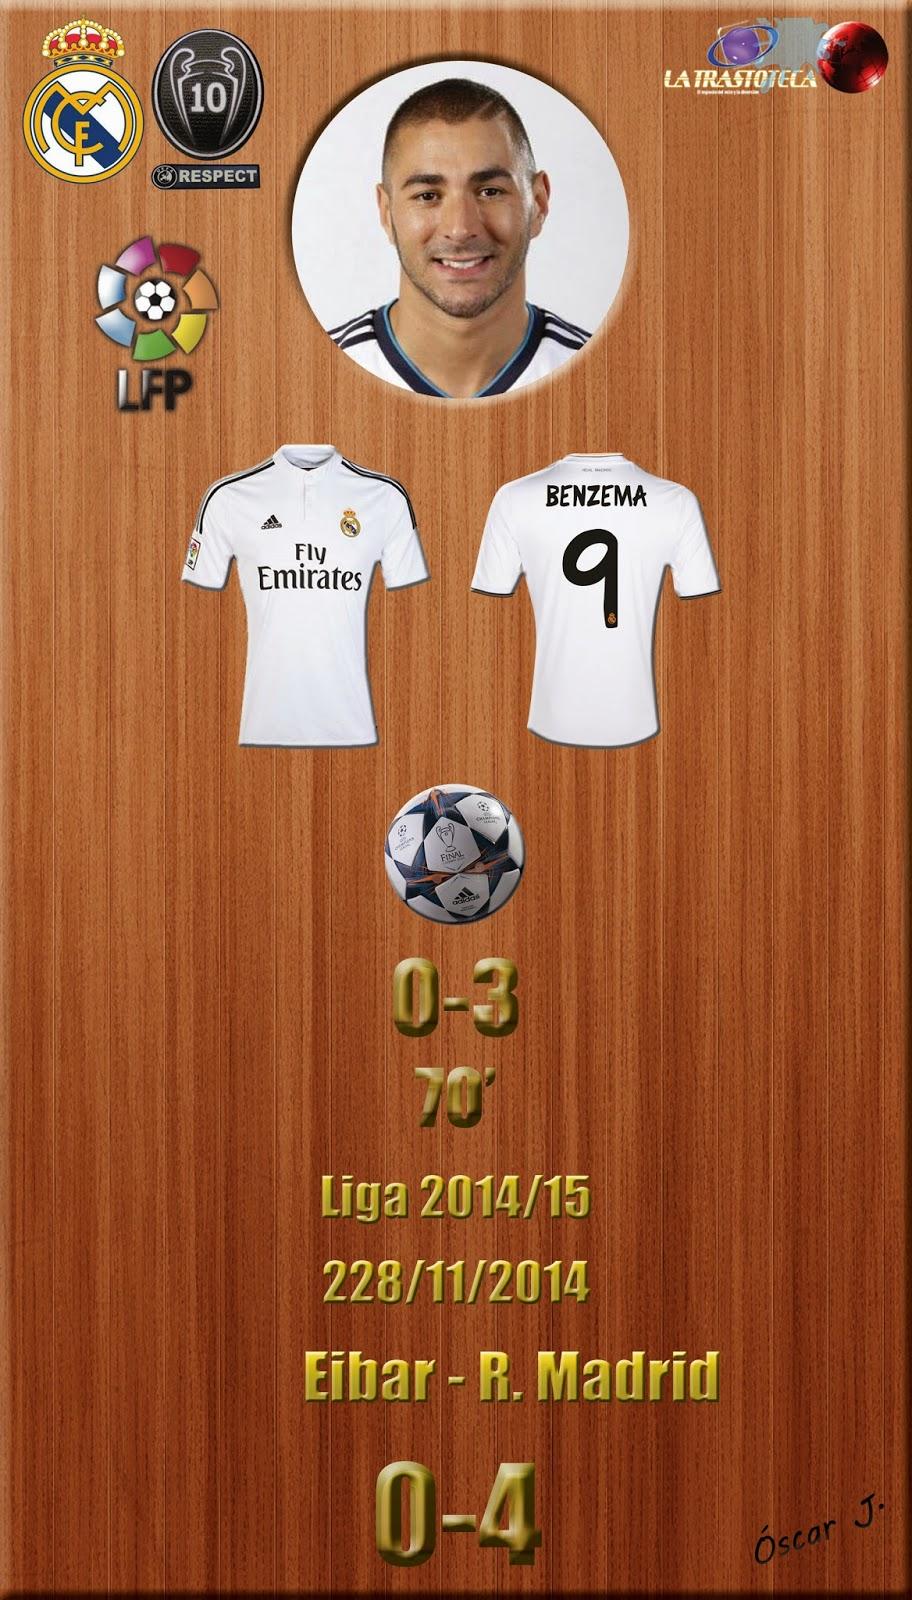 Benzema (0-3) - Eibar 0-4 Real Madrid - Liga 2014/15 - Jornada 12 - (22/11/2014)